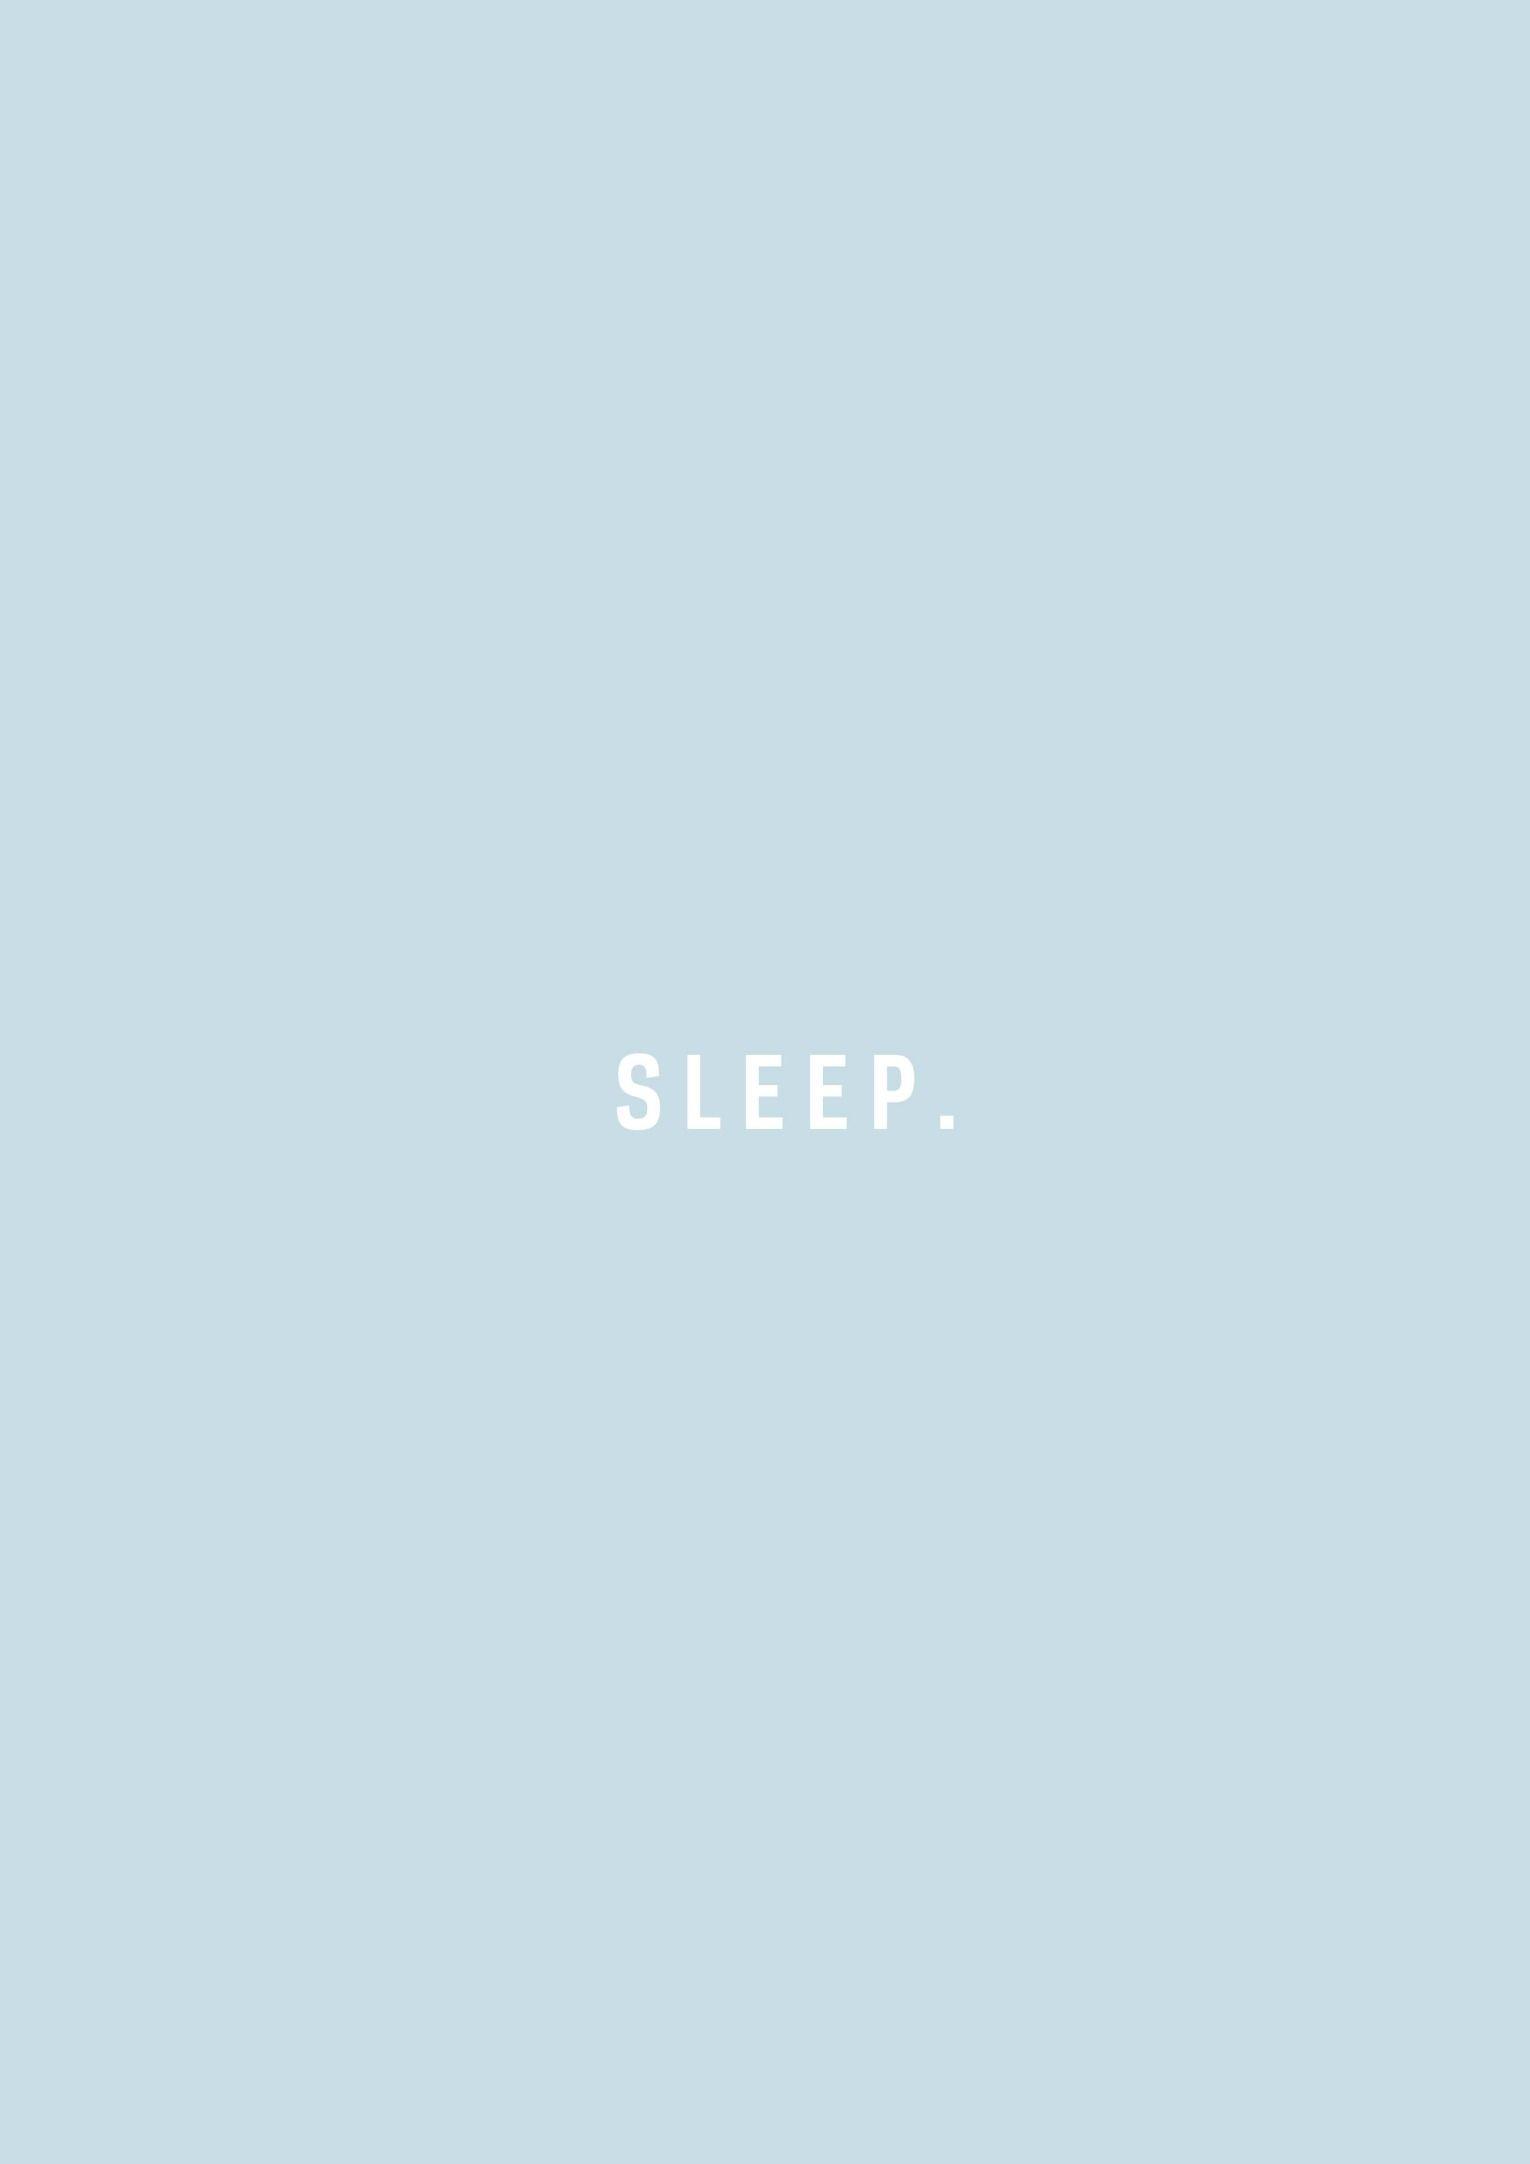 Join Our Pinterest Fam Skinnymetea 130k Wallpaper Quotes Blue Aesthetic Aesthetic Wallpapers